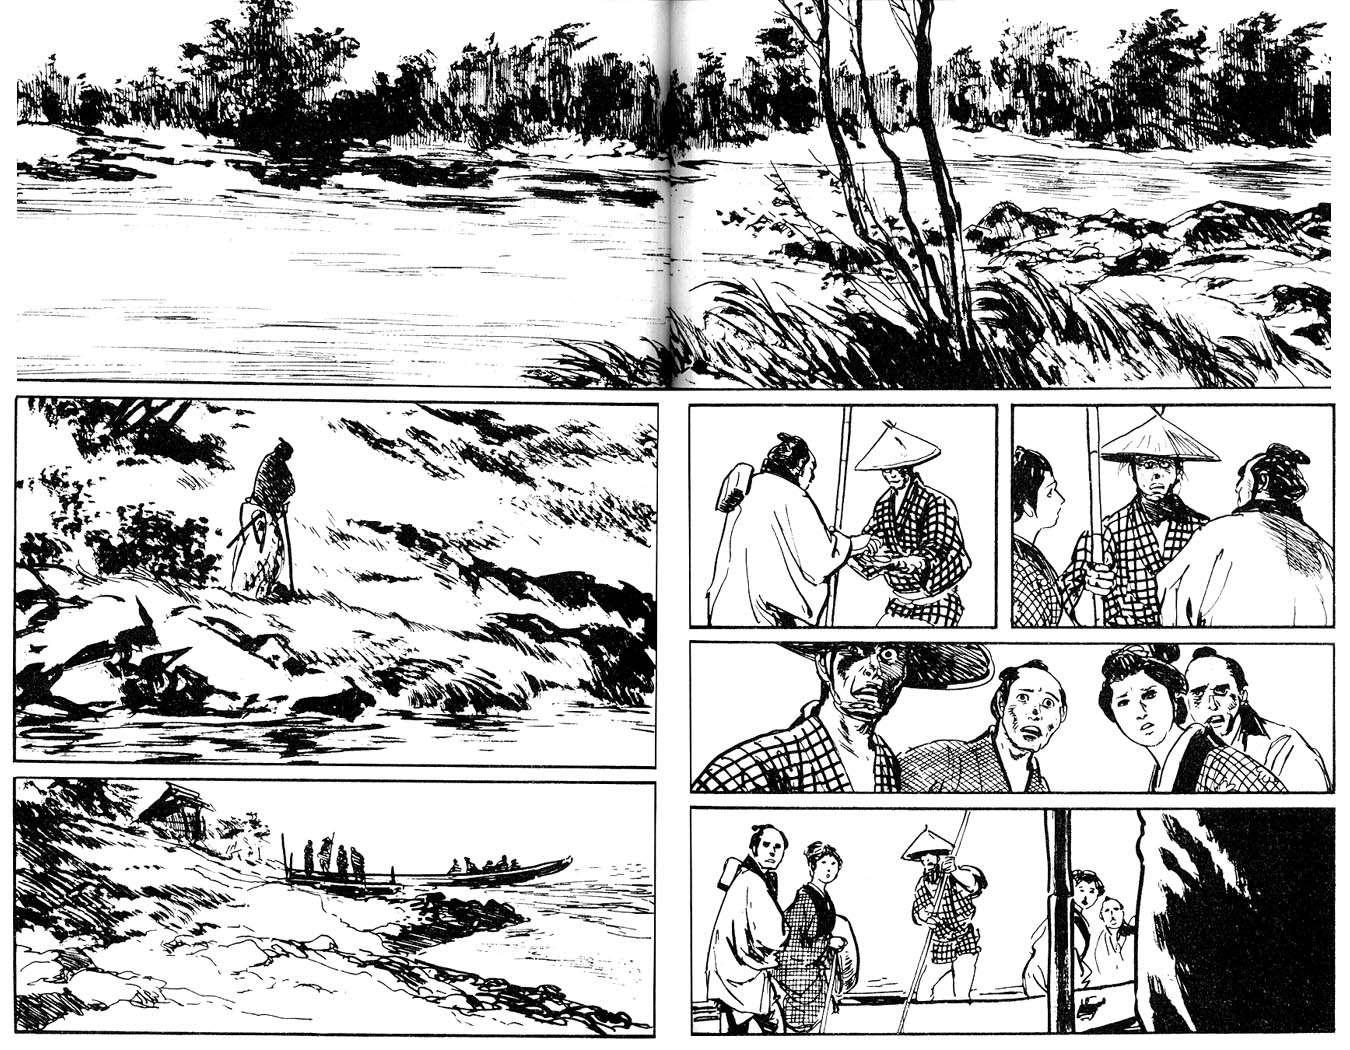 https://c5.ninemanga.com/es_manga/36/18212/430007/2432fc2efe99899b0ecff8ade0211e7d.jpg Page 47